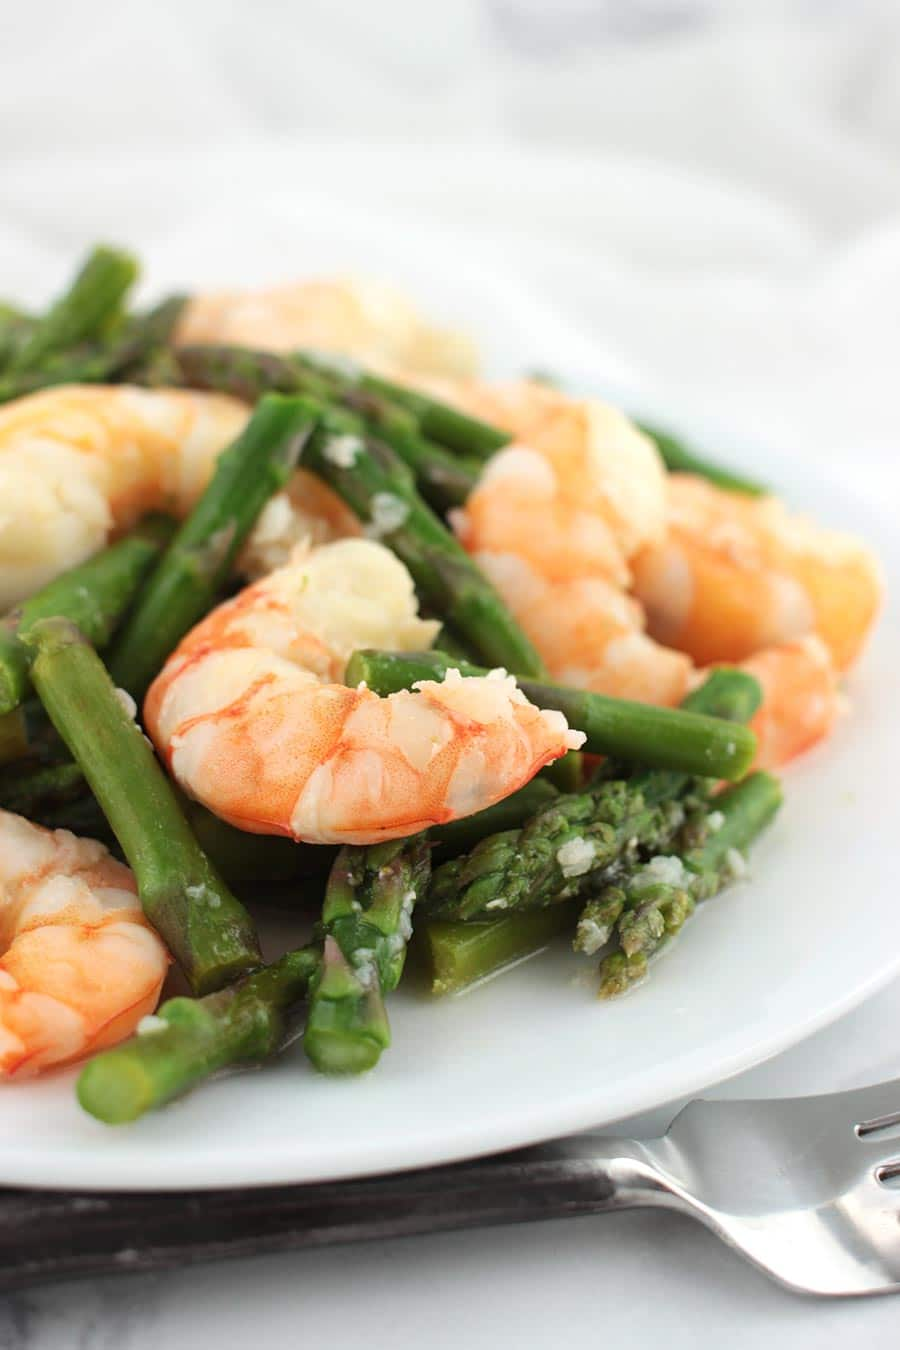 Garlic Lemon Asparagus Shrimp Stir Fry by A Clean Plate